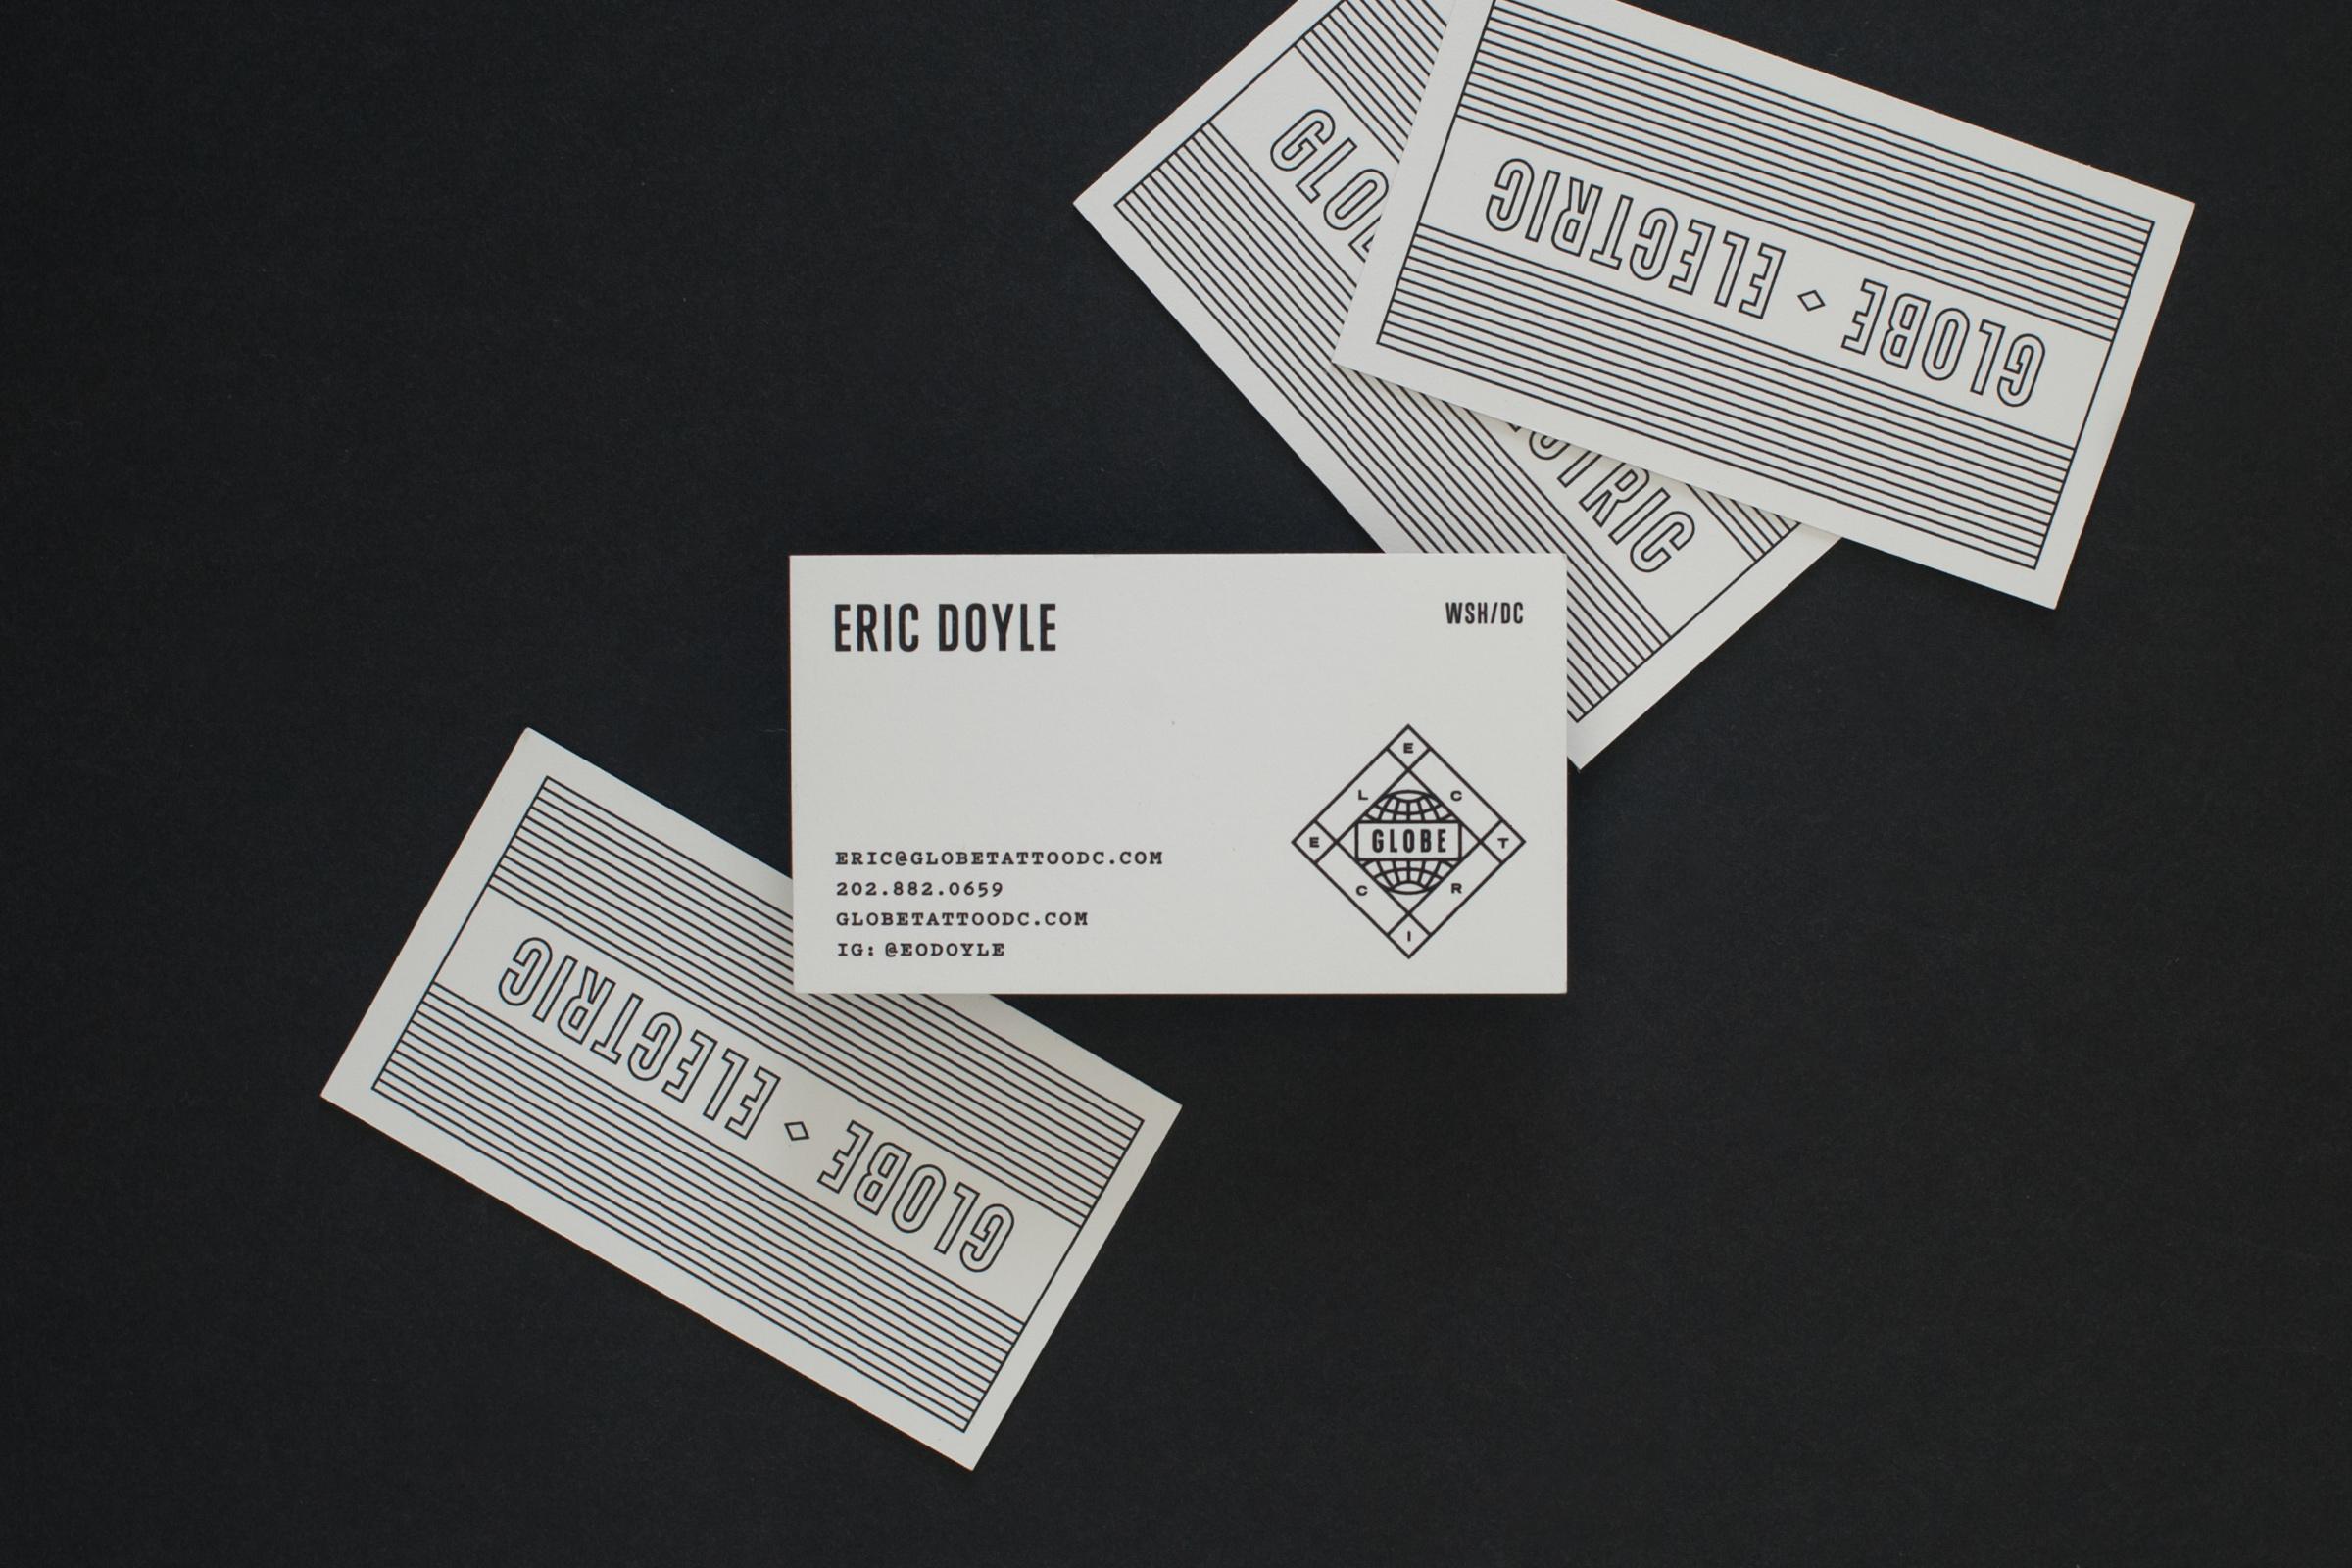 Globe_Electric_Tattoo__Branding_Design_3.jpg